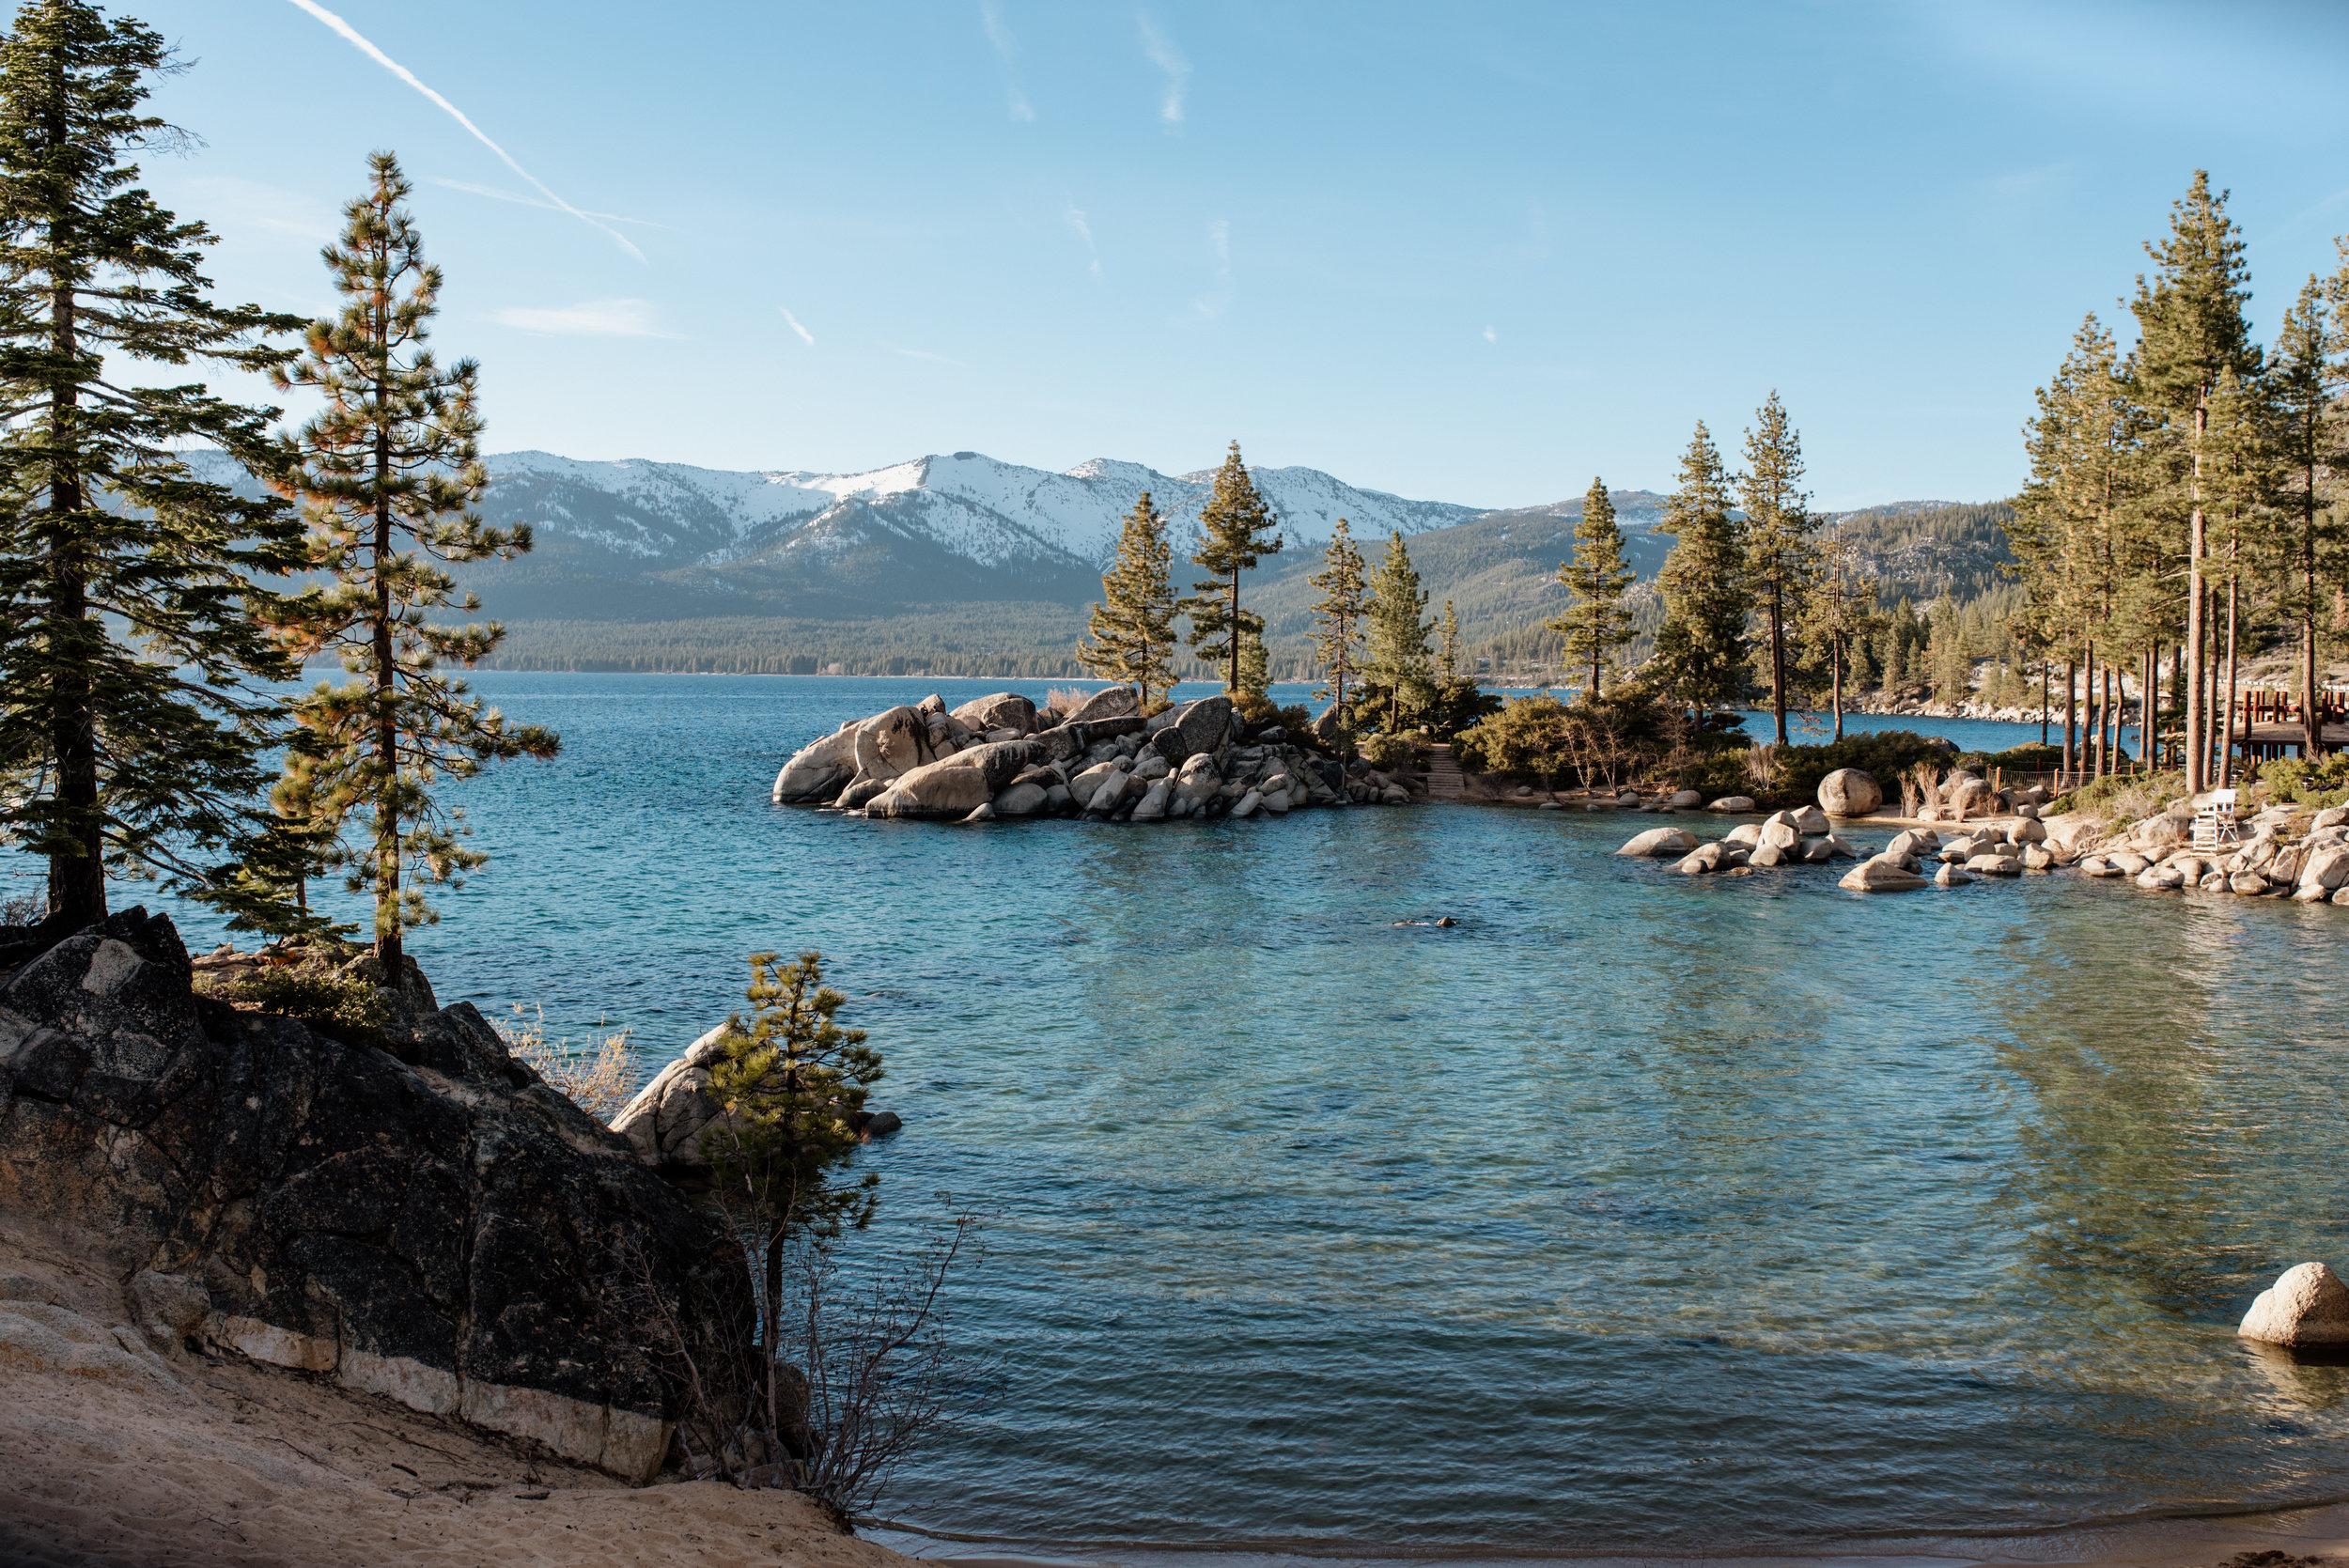 Rachael-Marie-photography-tahoe-2.jpg